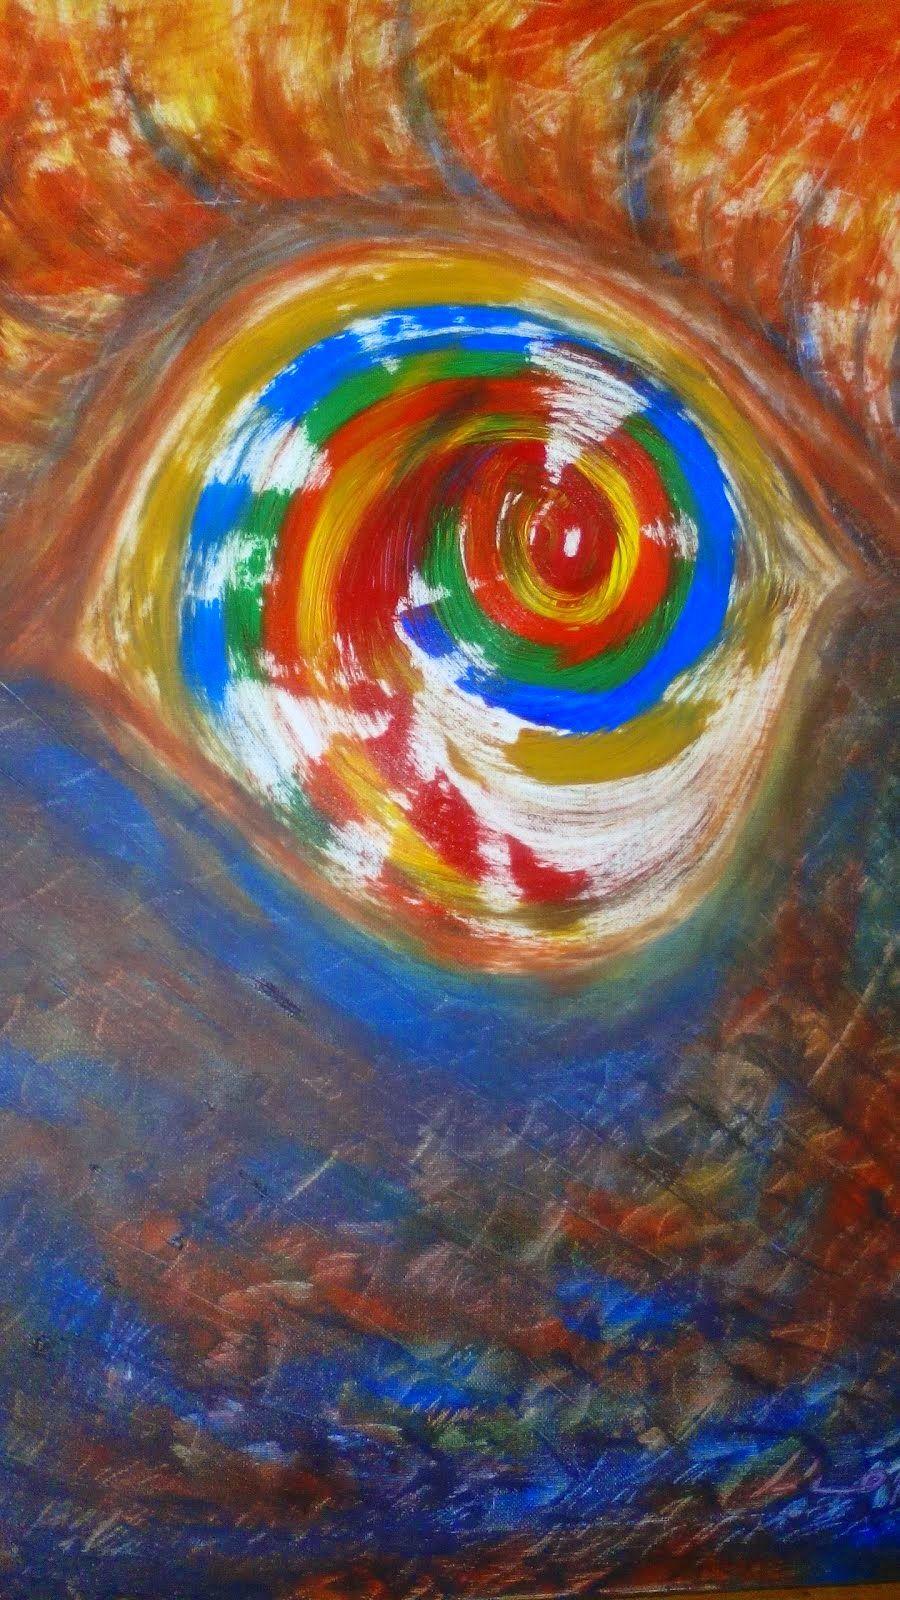 O olho odelicadosomdosilncio.blogspot.pt